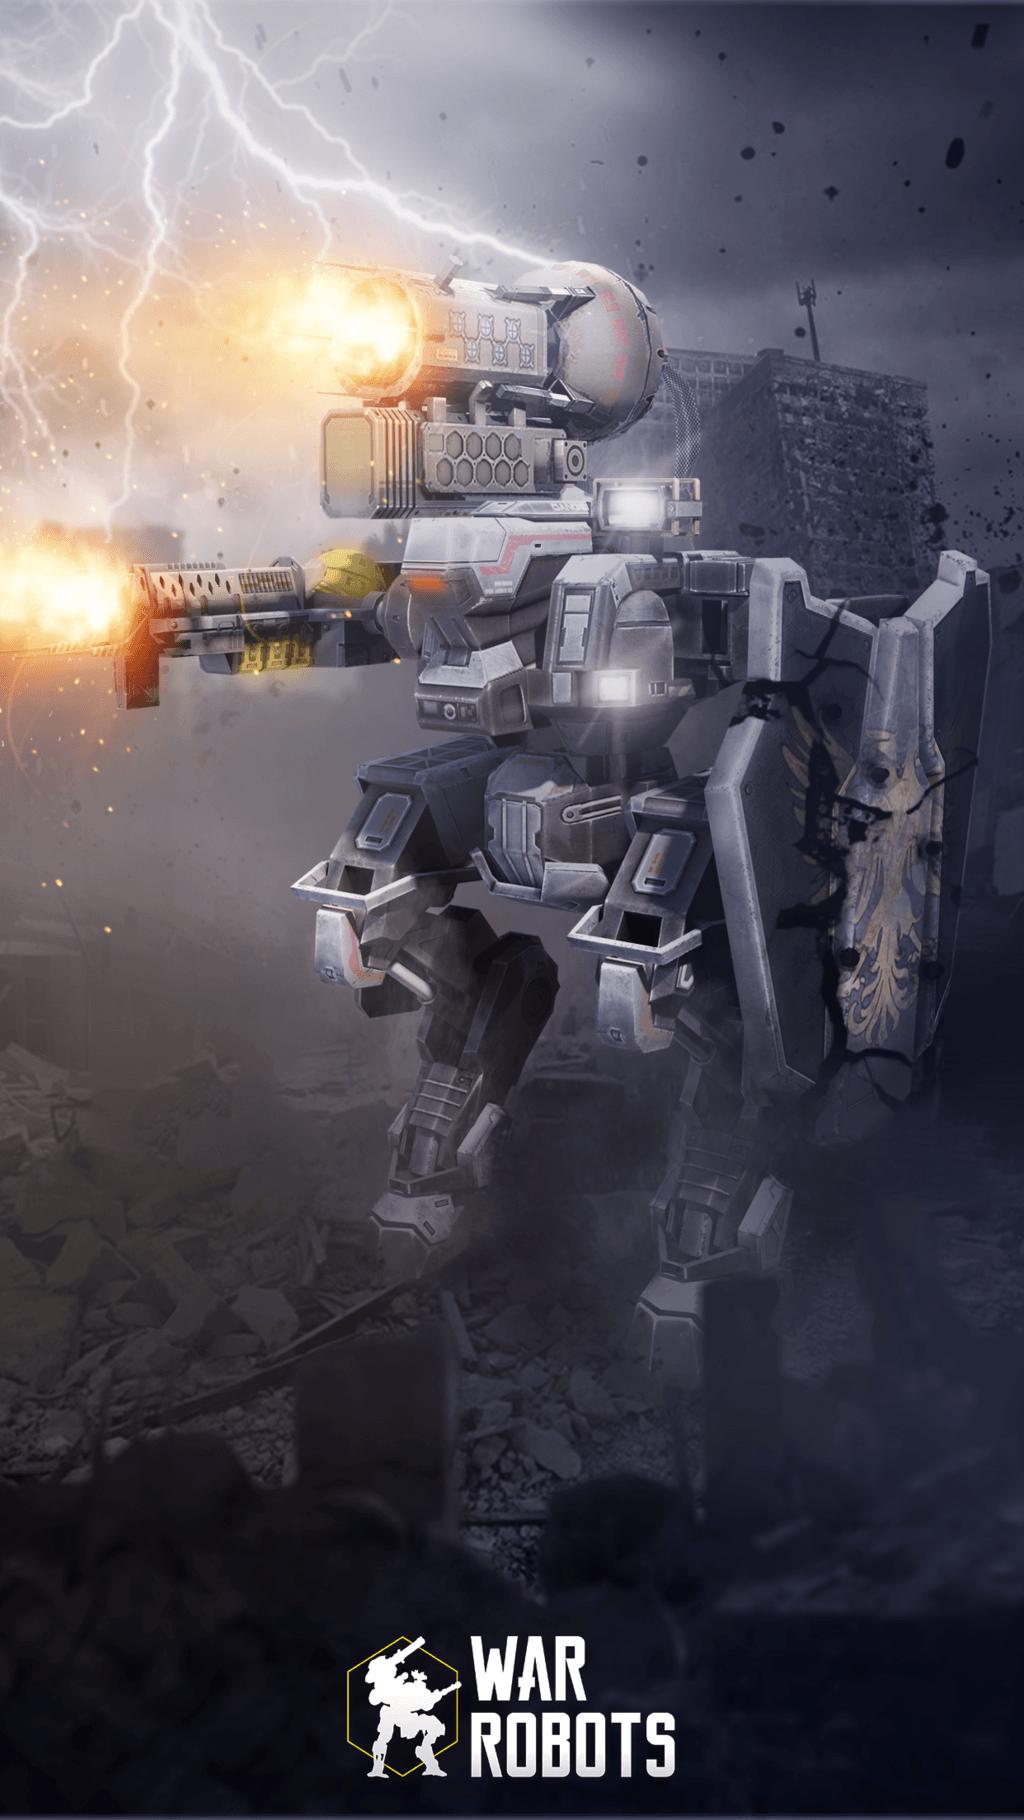 War Robots Mobile Wallpapers Wallpaper Cave